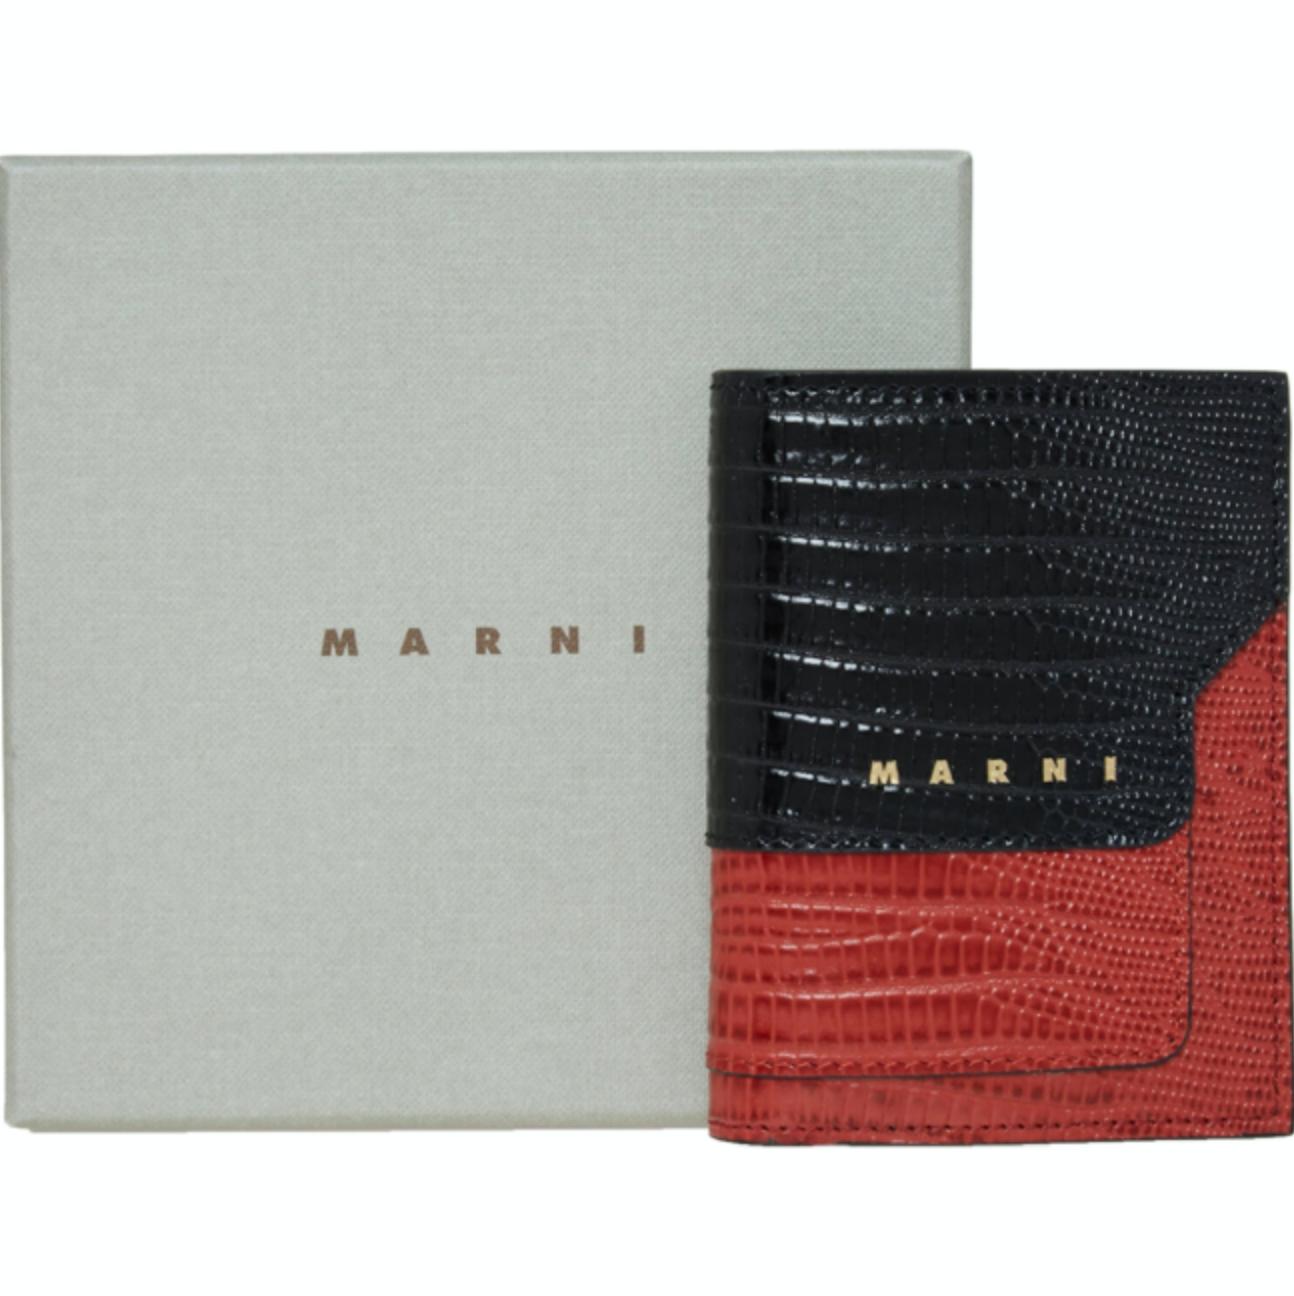 MARNI Croc Print Leather Bi-Fold Bi-Coloured Wallet